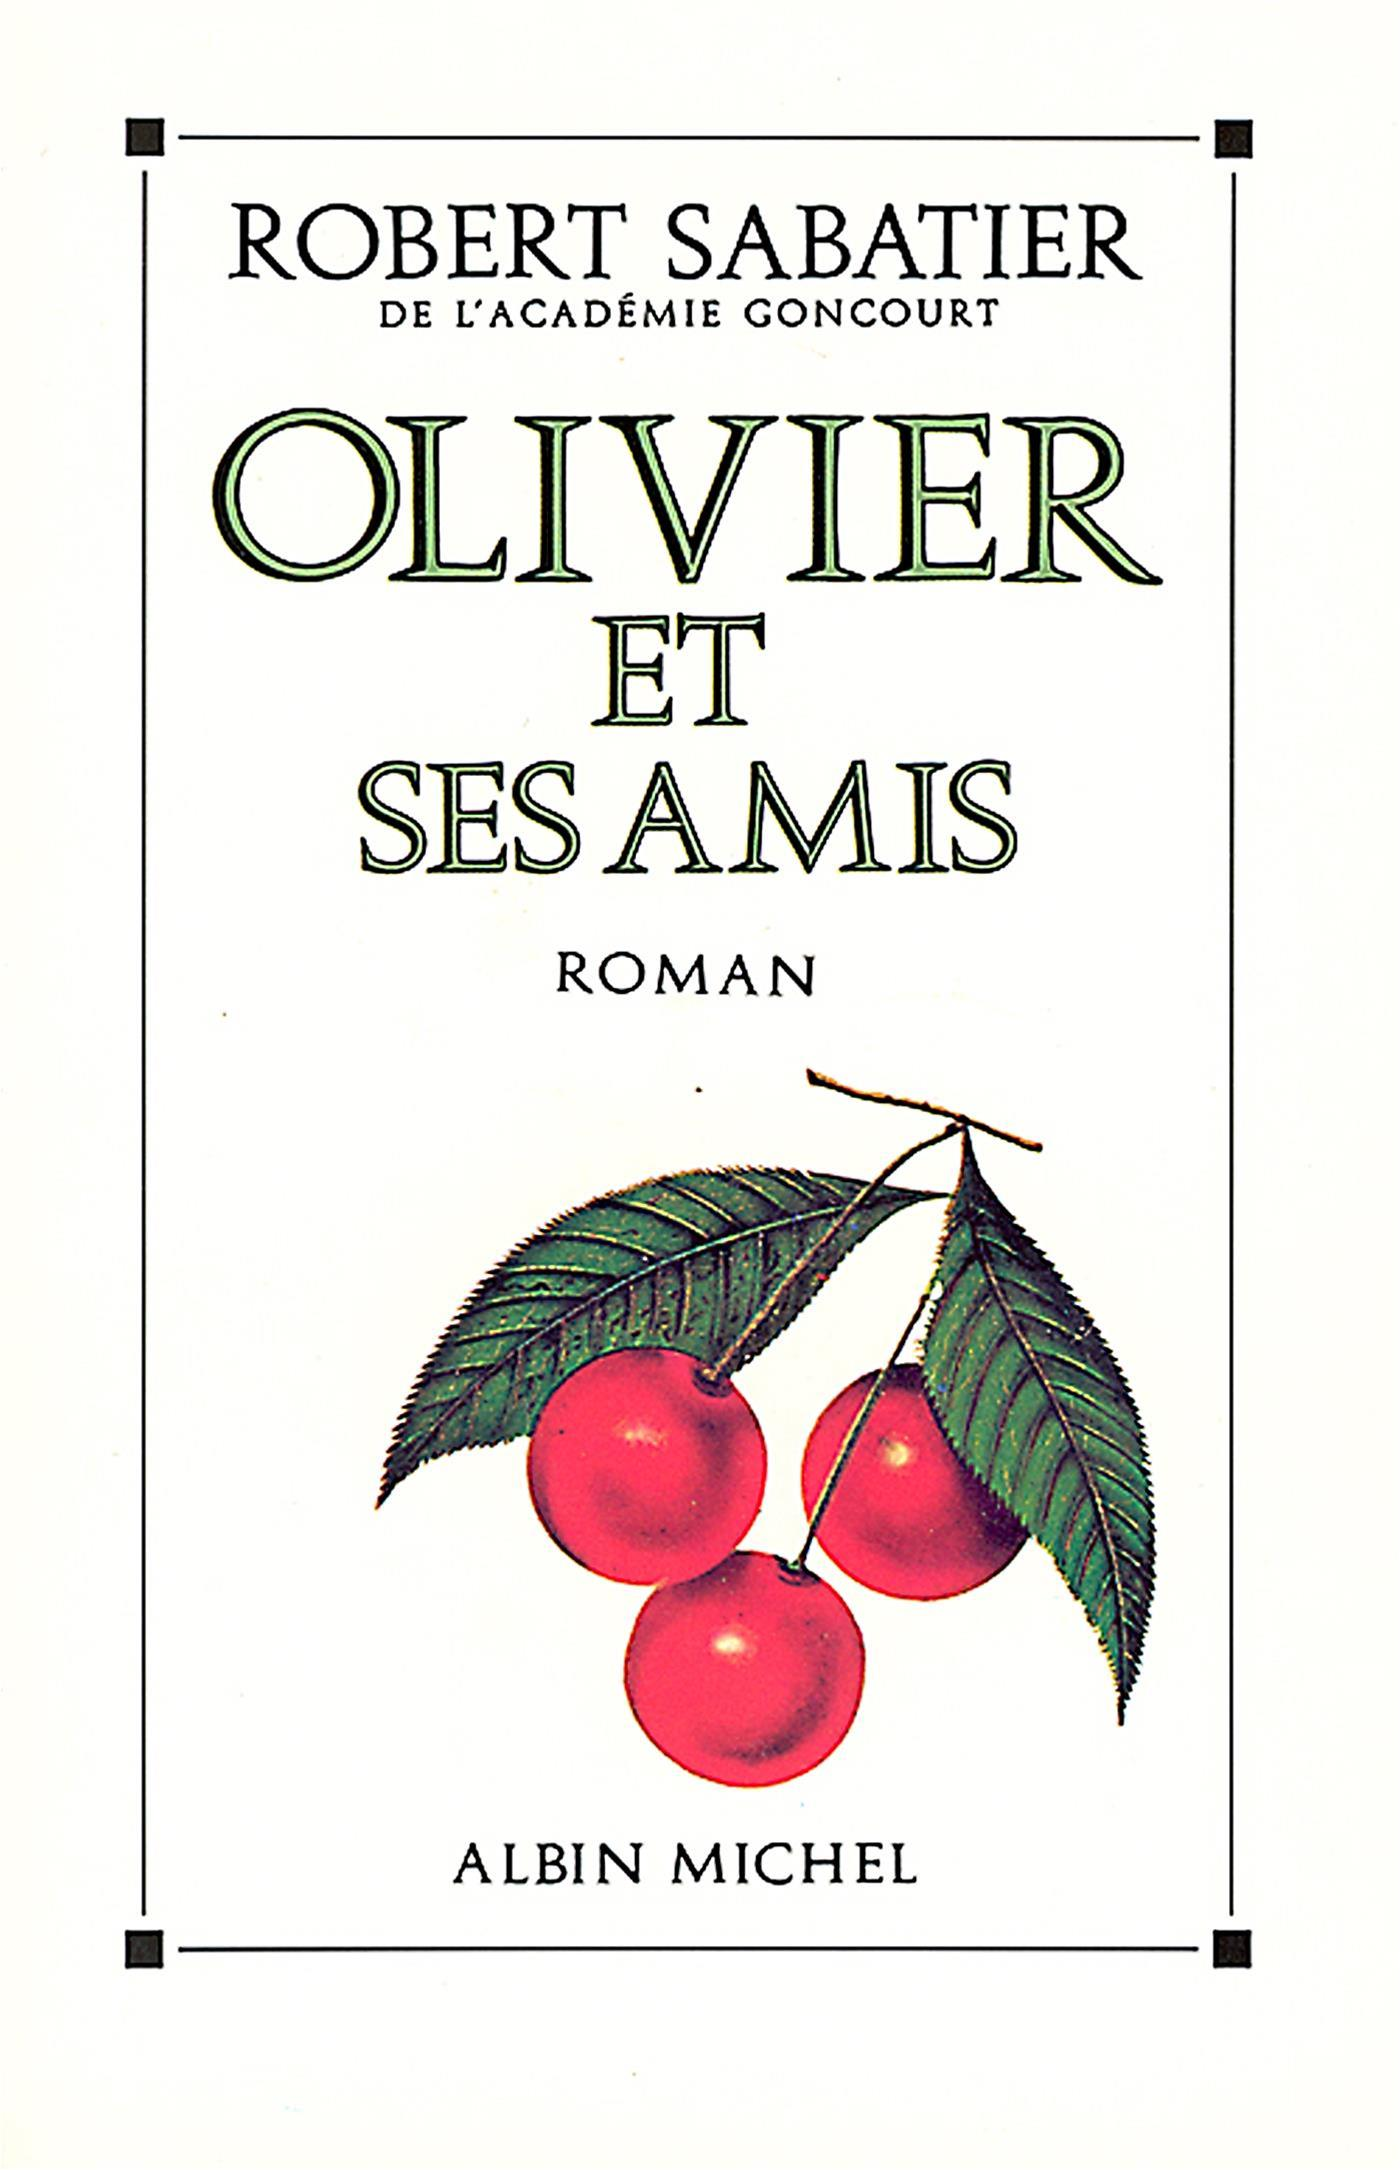 Olivier et ses amis